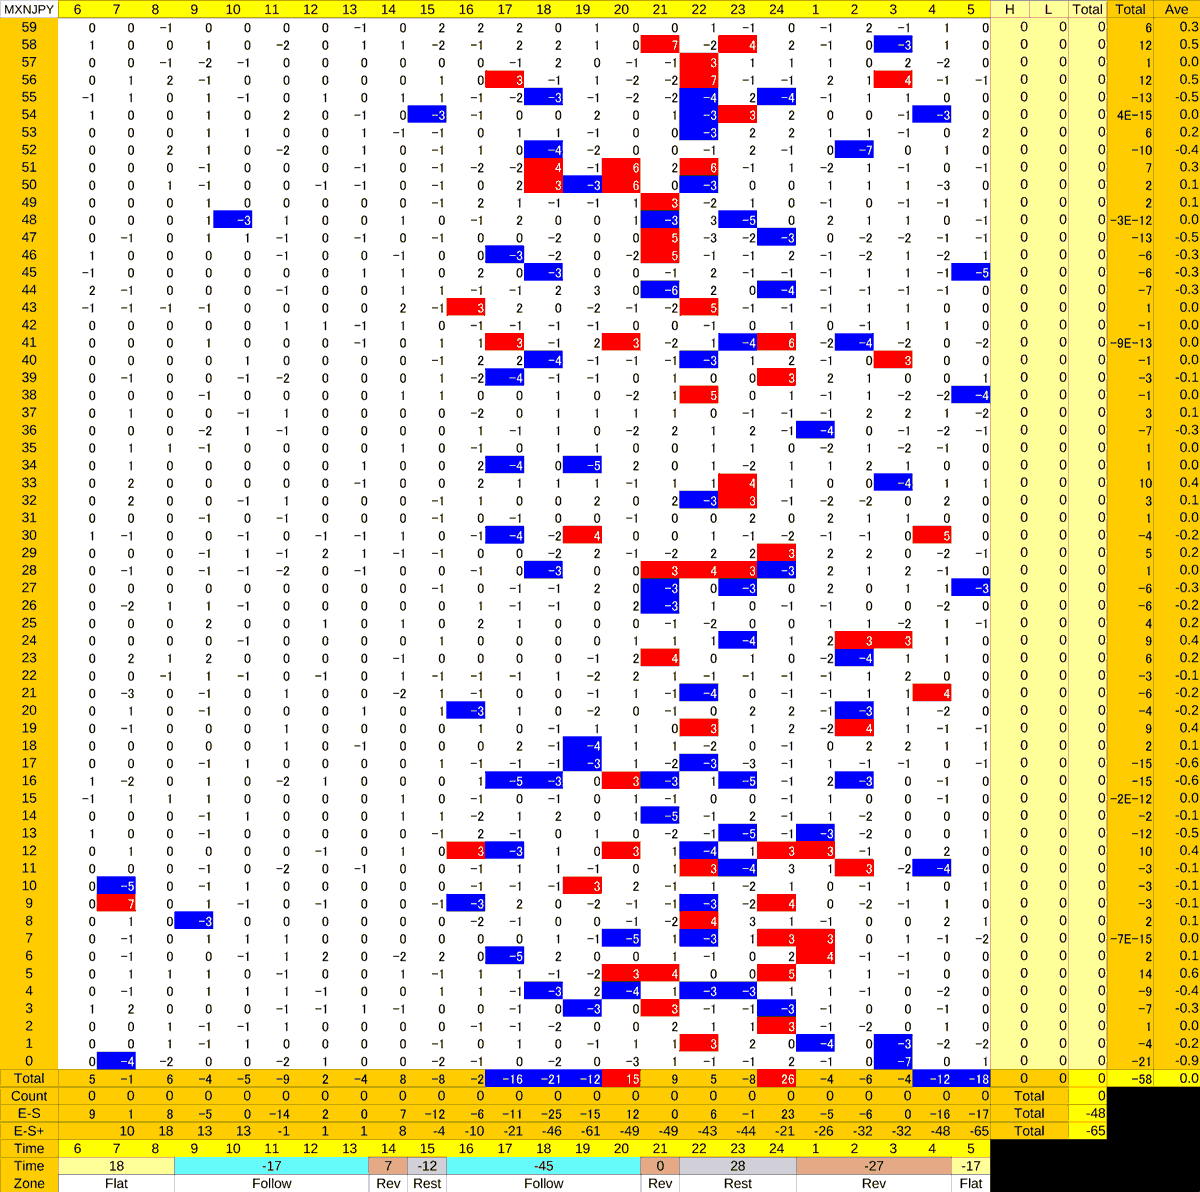 20201028_HS(3)MXNJPY